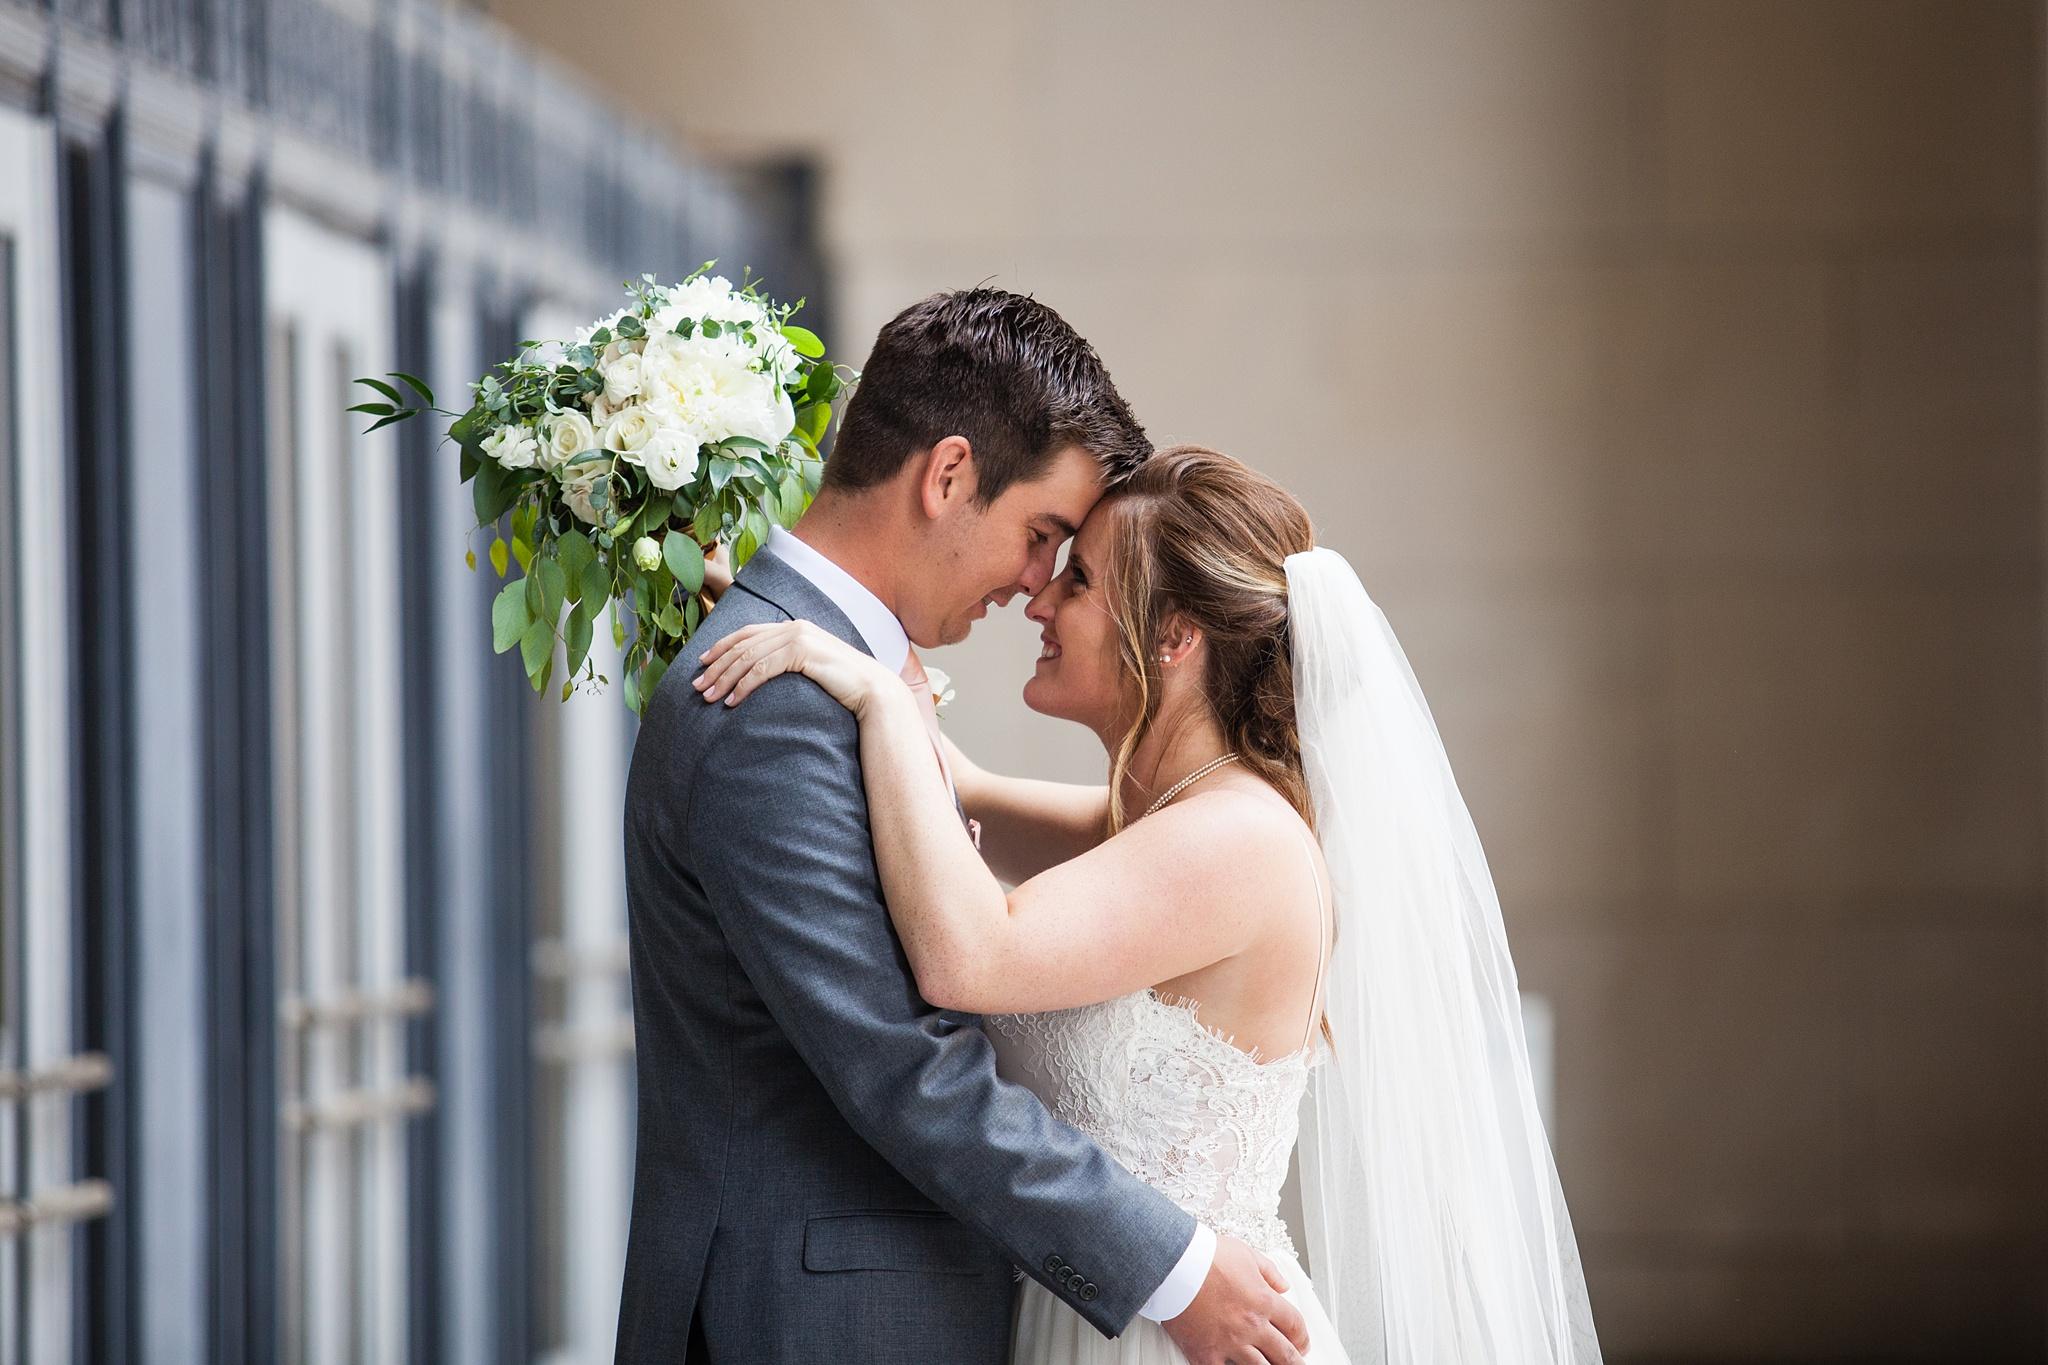 Meghan_Drew_Grand_Rapids_Cheney_place_Wedding044.JPG